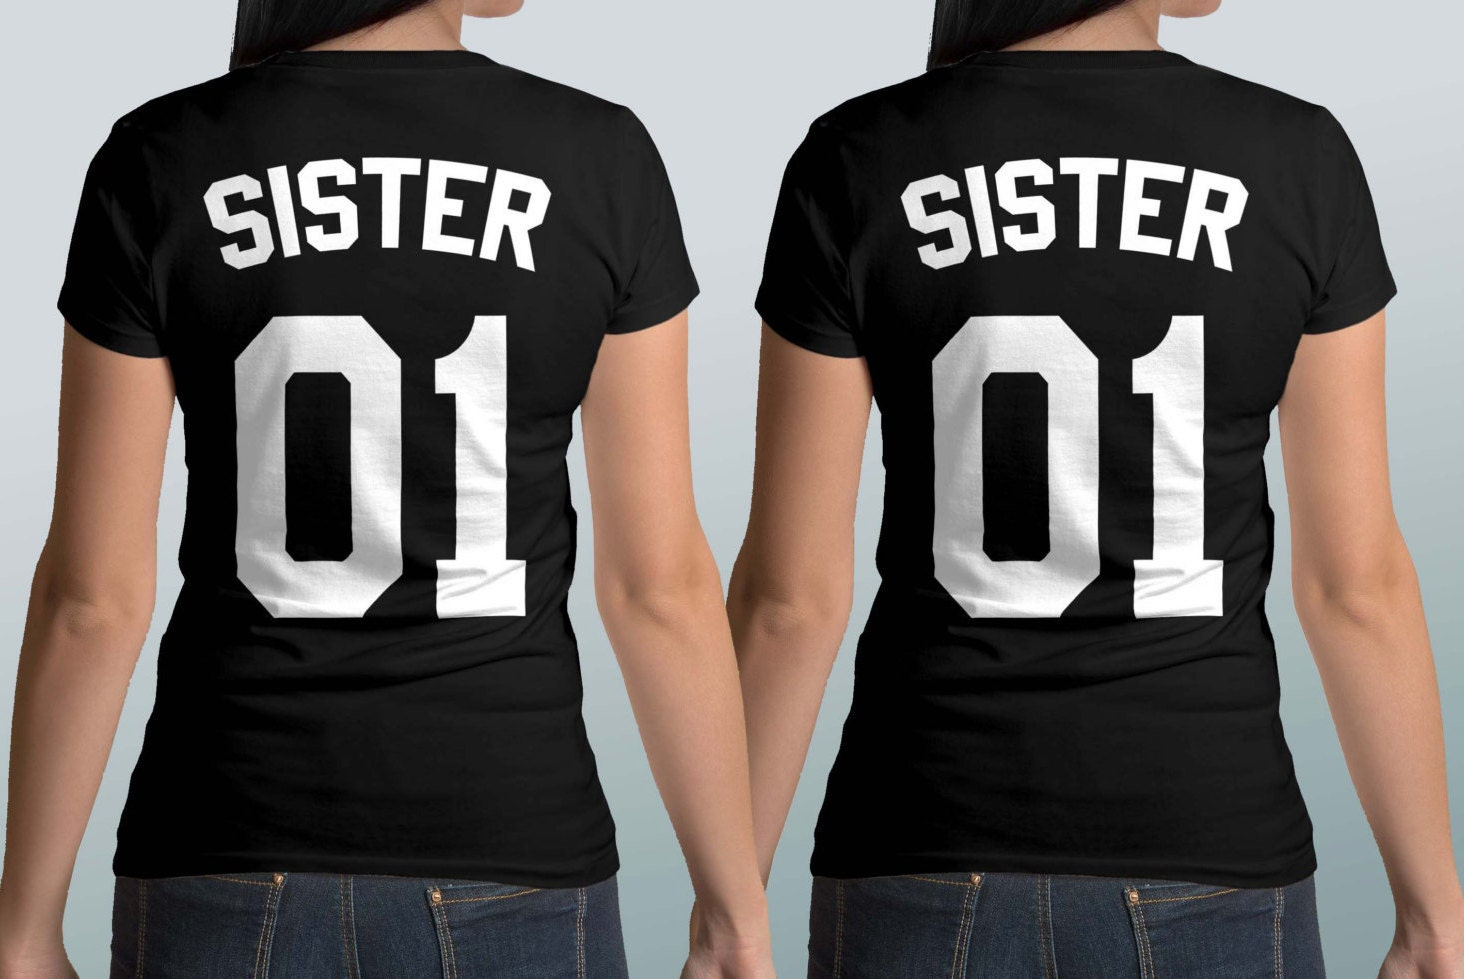 sister t shirts sister 01 shirt big sister shirt by